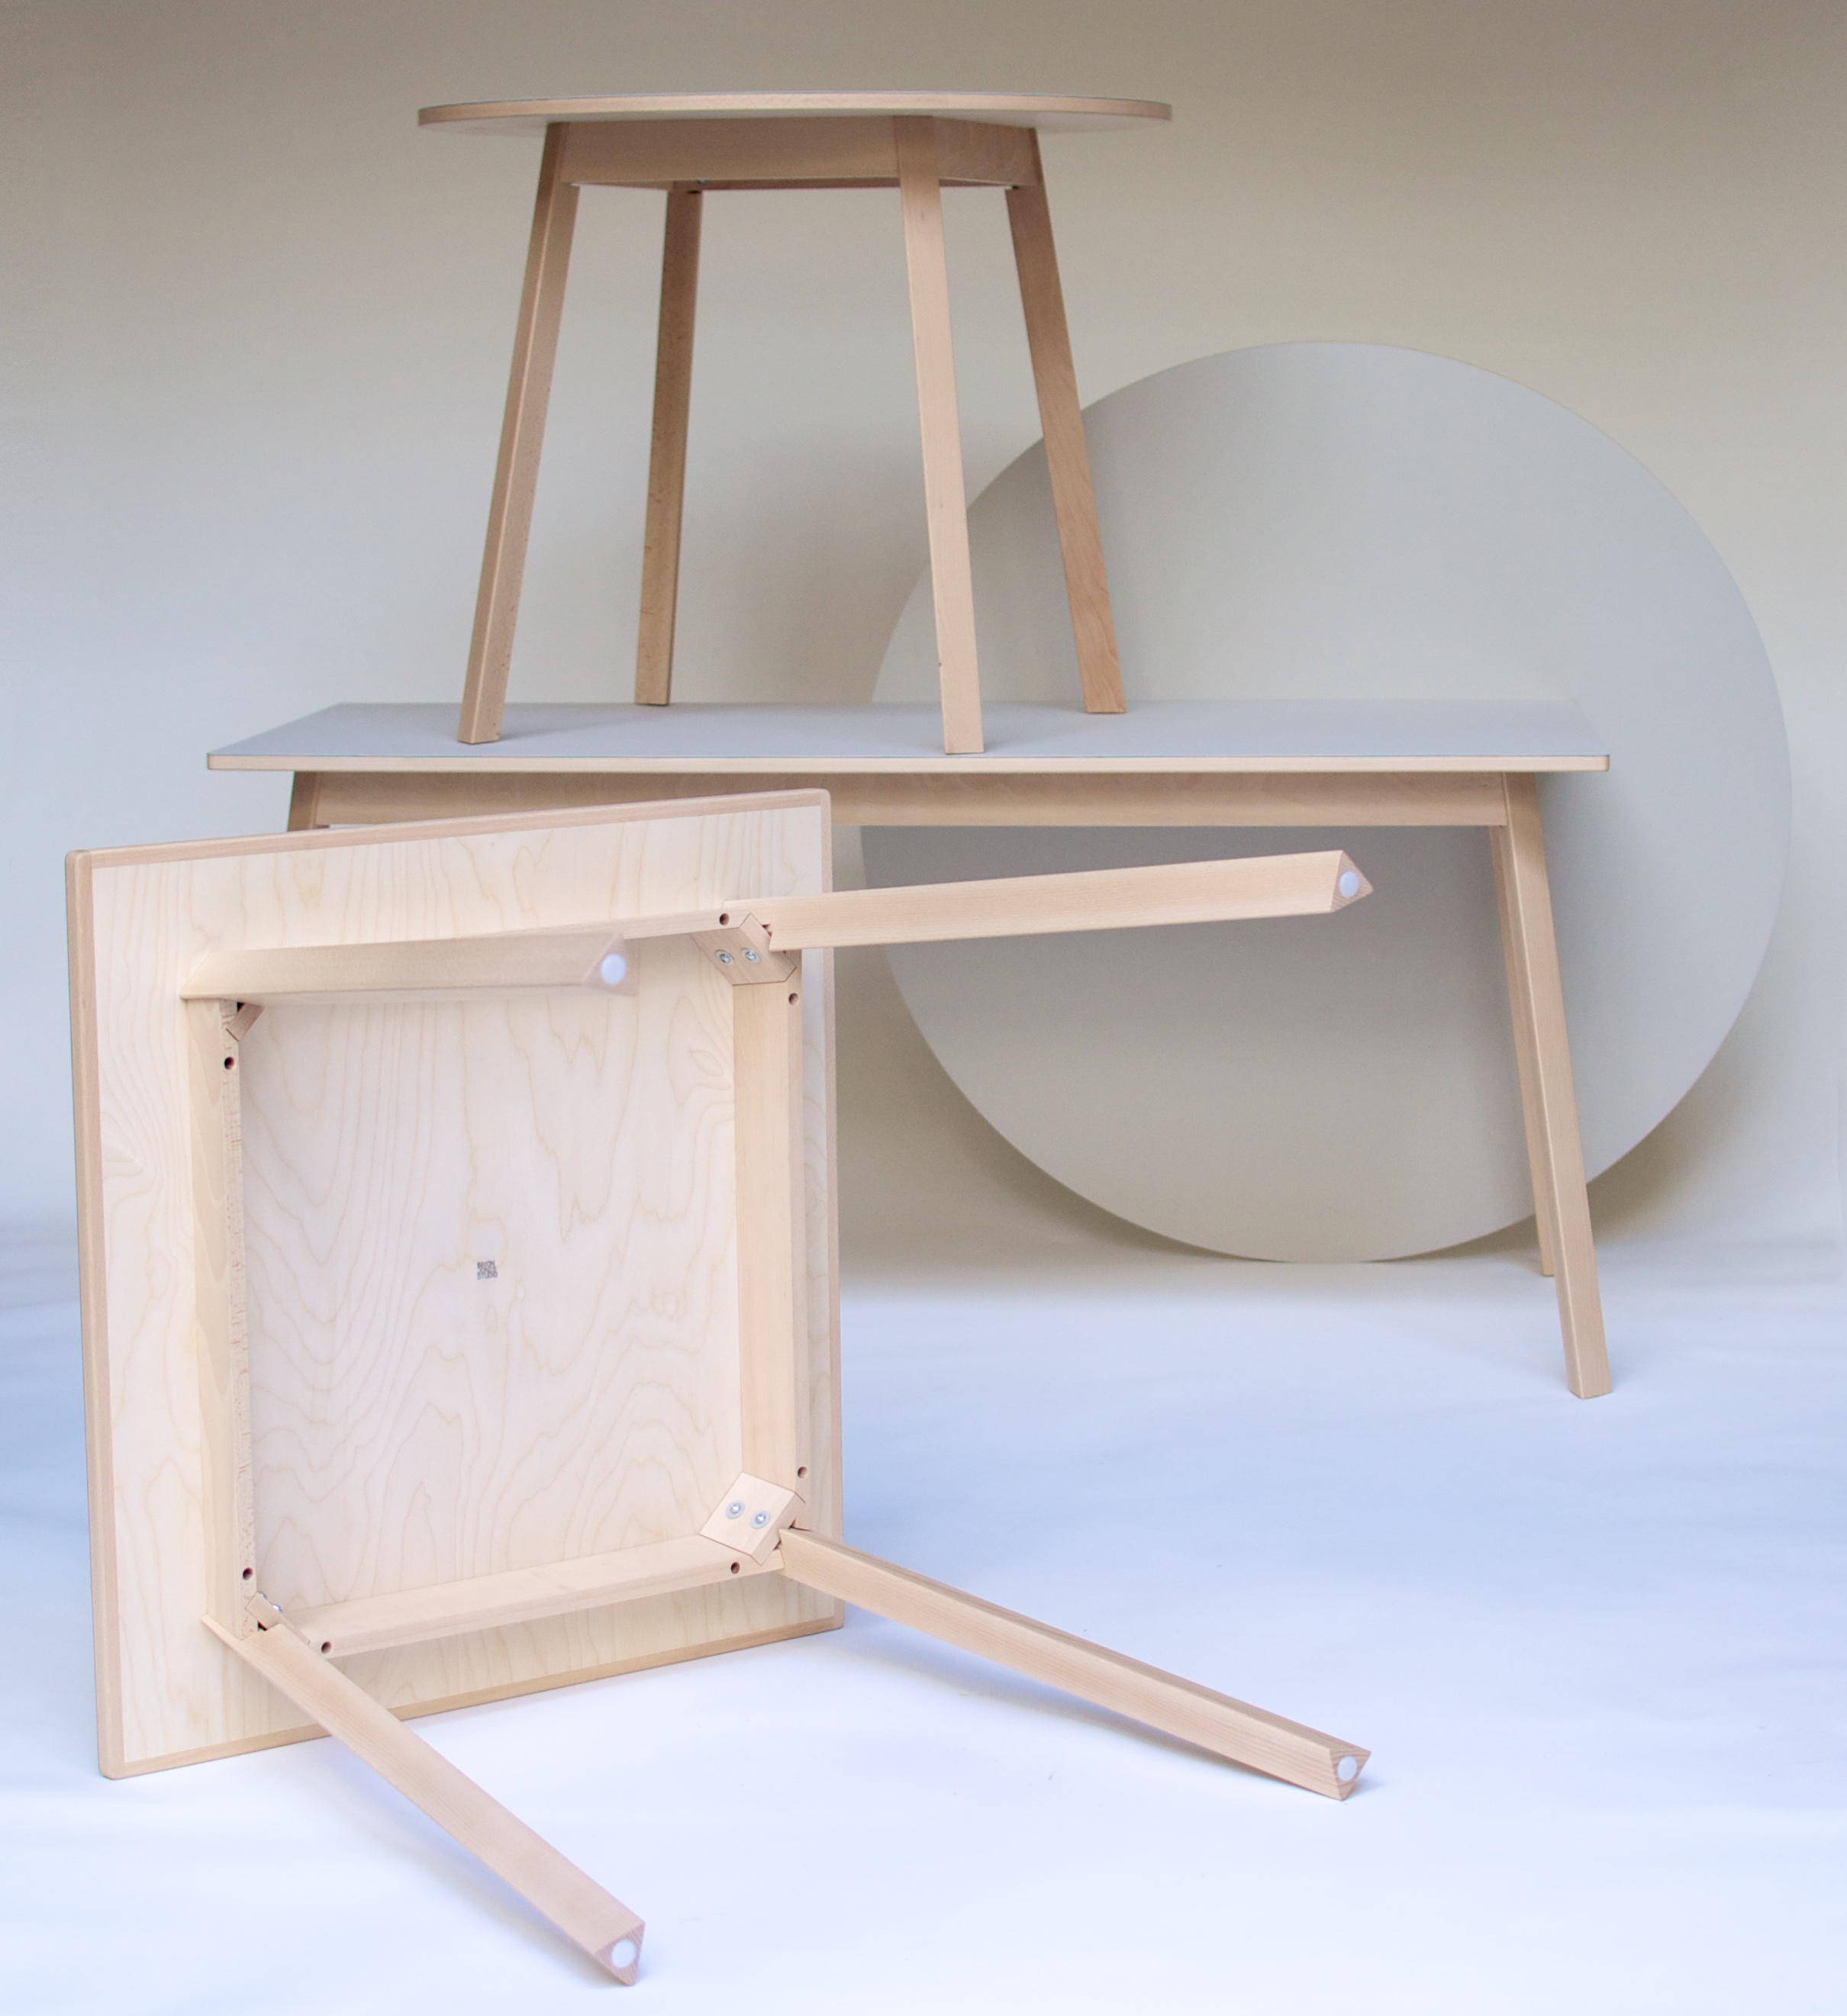 Triangular Leg Table 9